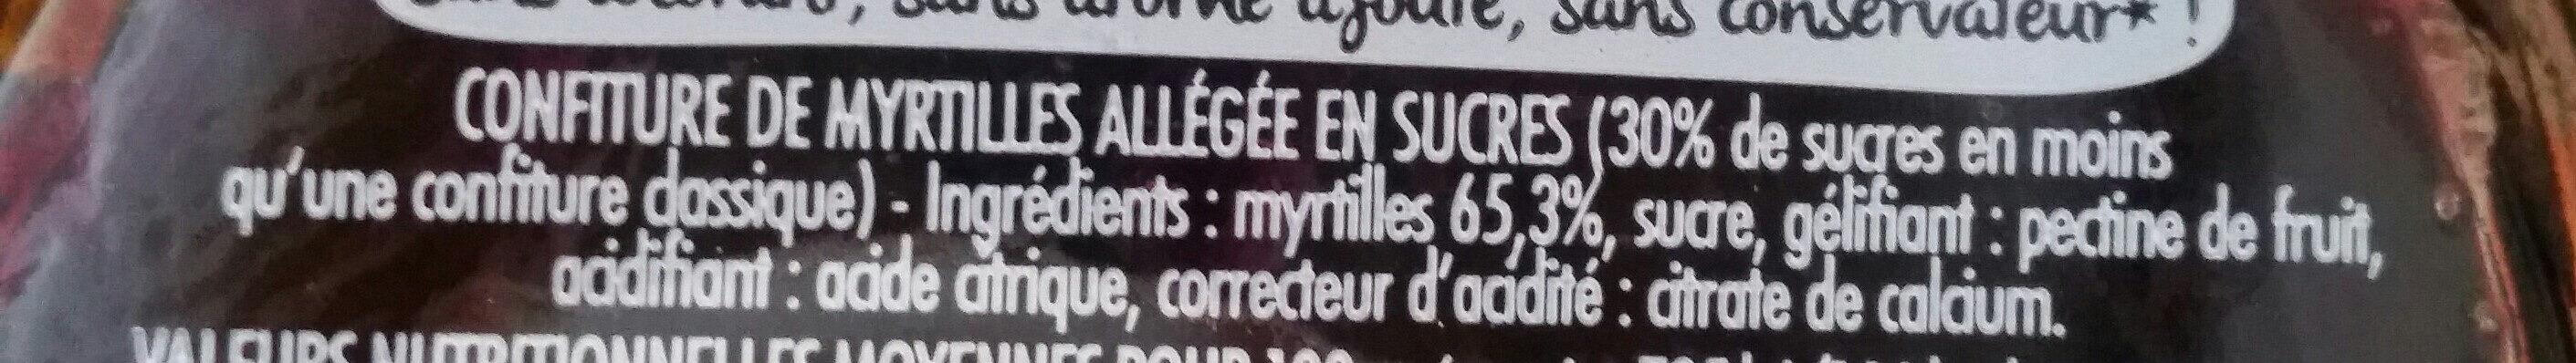 CONFIPOTE La myrtille - Ingredients - fr